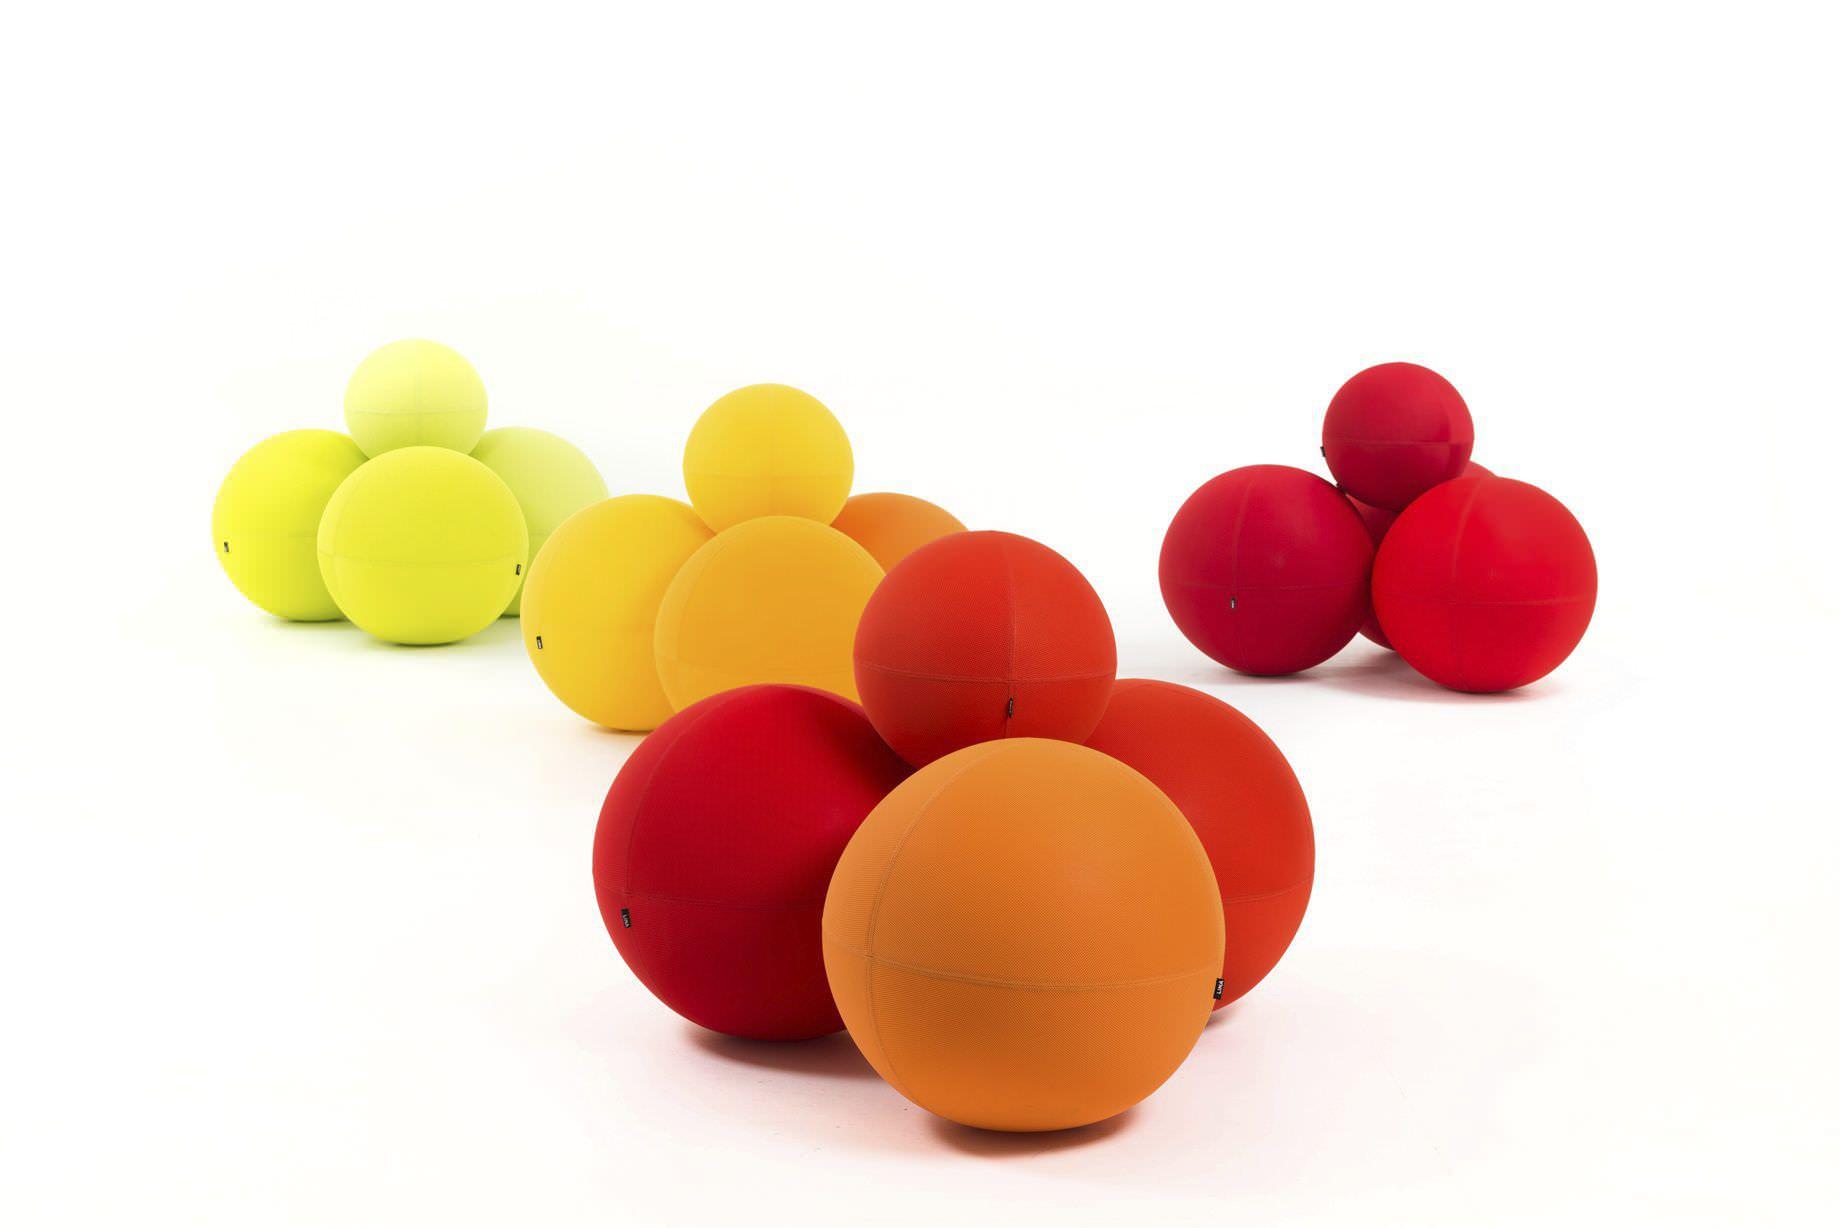 Genial Original Design Pouf / Fabric / Round / Modular. THE BALL LINA Furniture